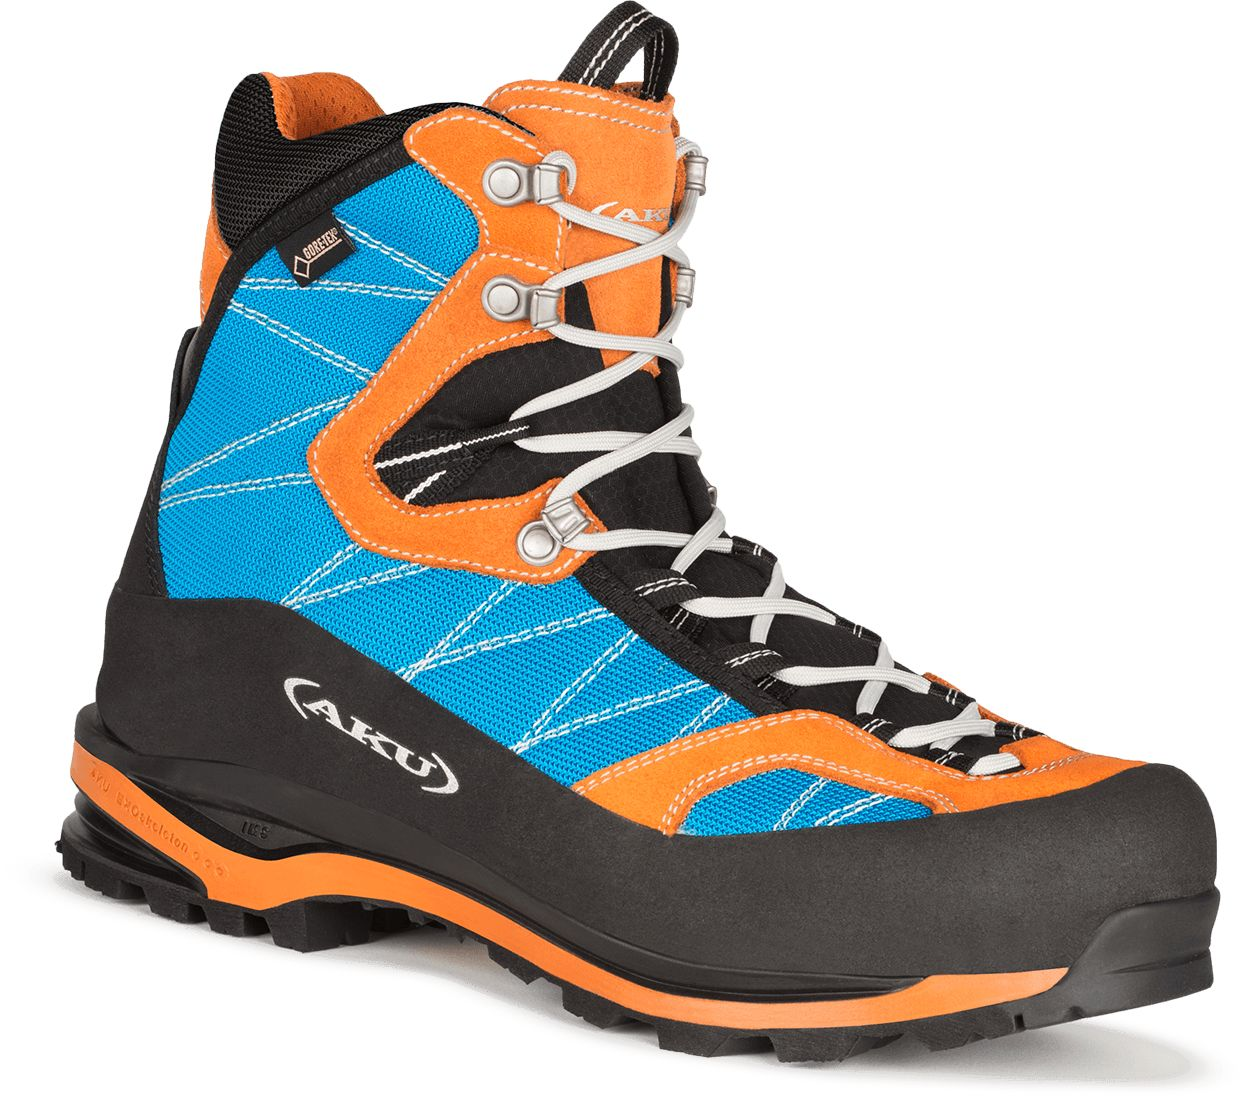 Aku Buty meskie Tengu Gtx Turquoise/ Orange r. 41 (974-454) 4051622 Tūrisma apavi